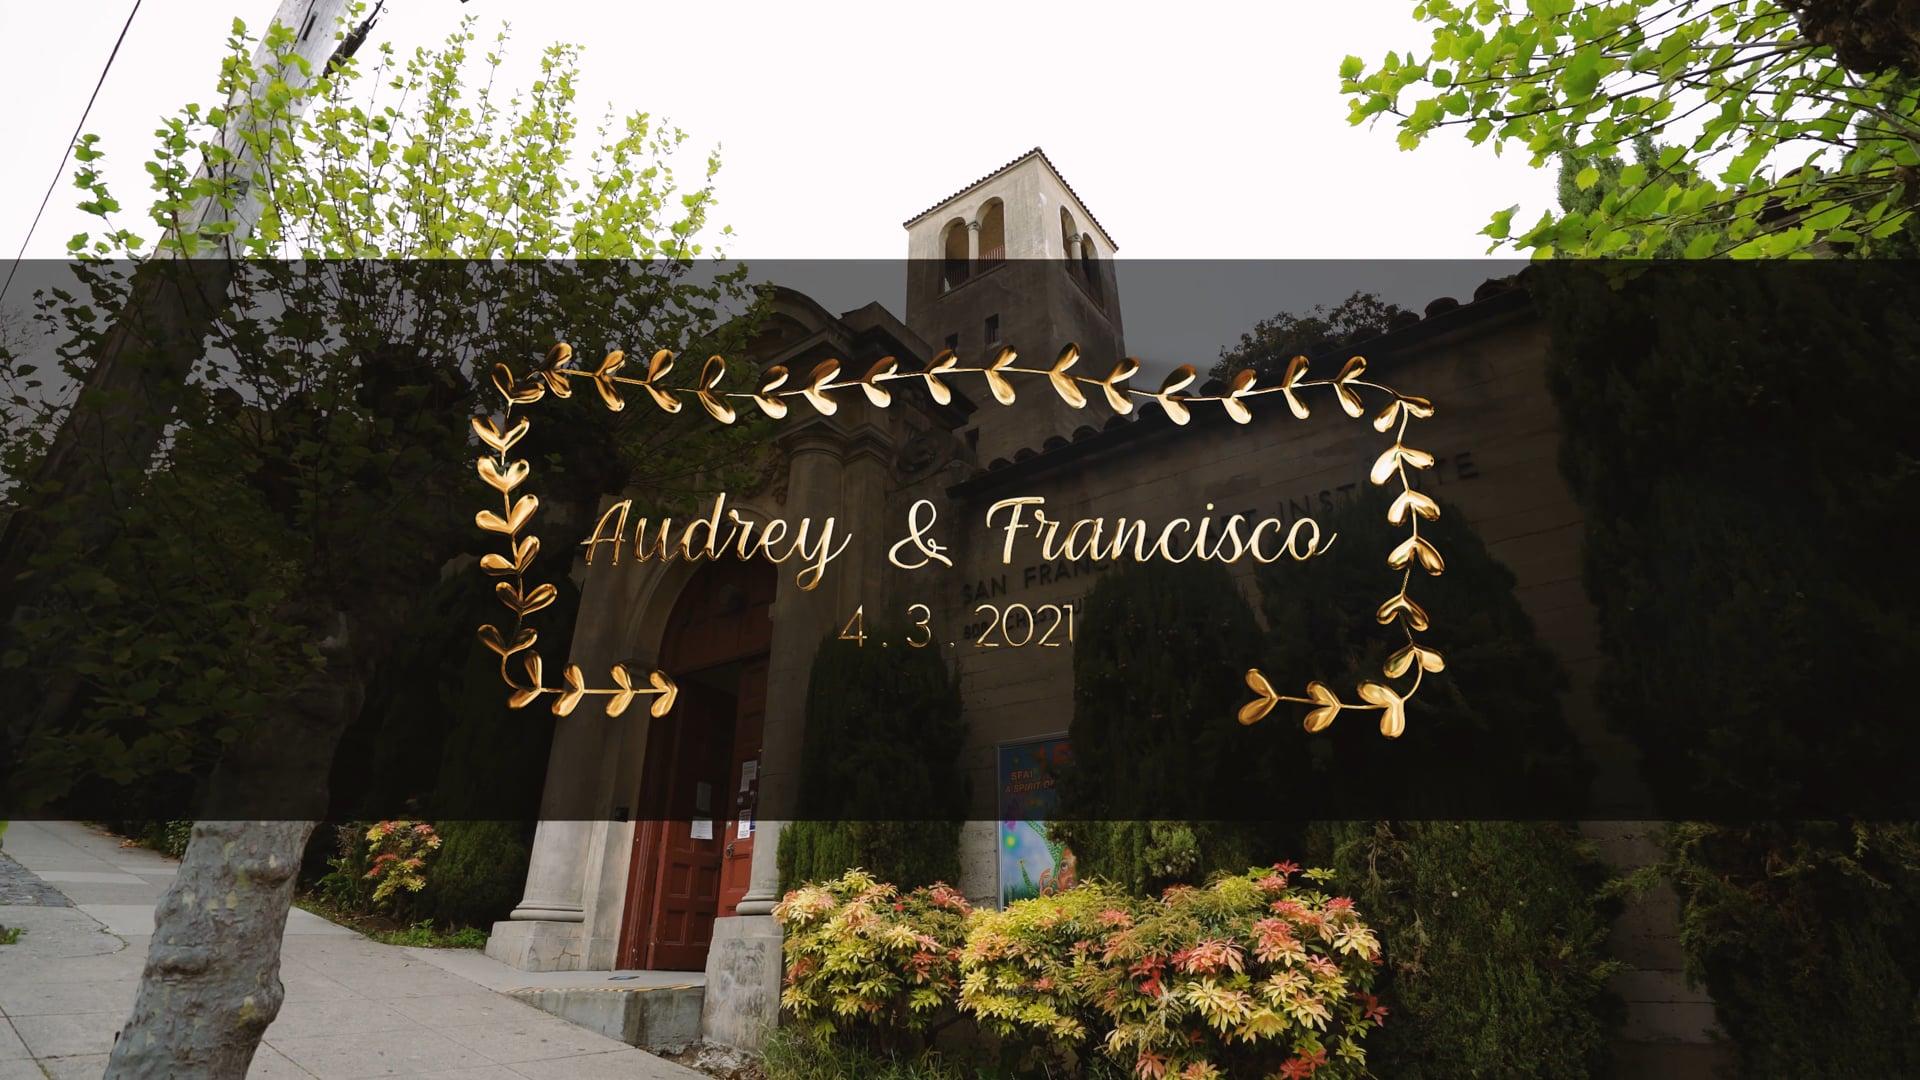 Audrey & Francisco Wedding   Cinematic Highlight Reel